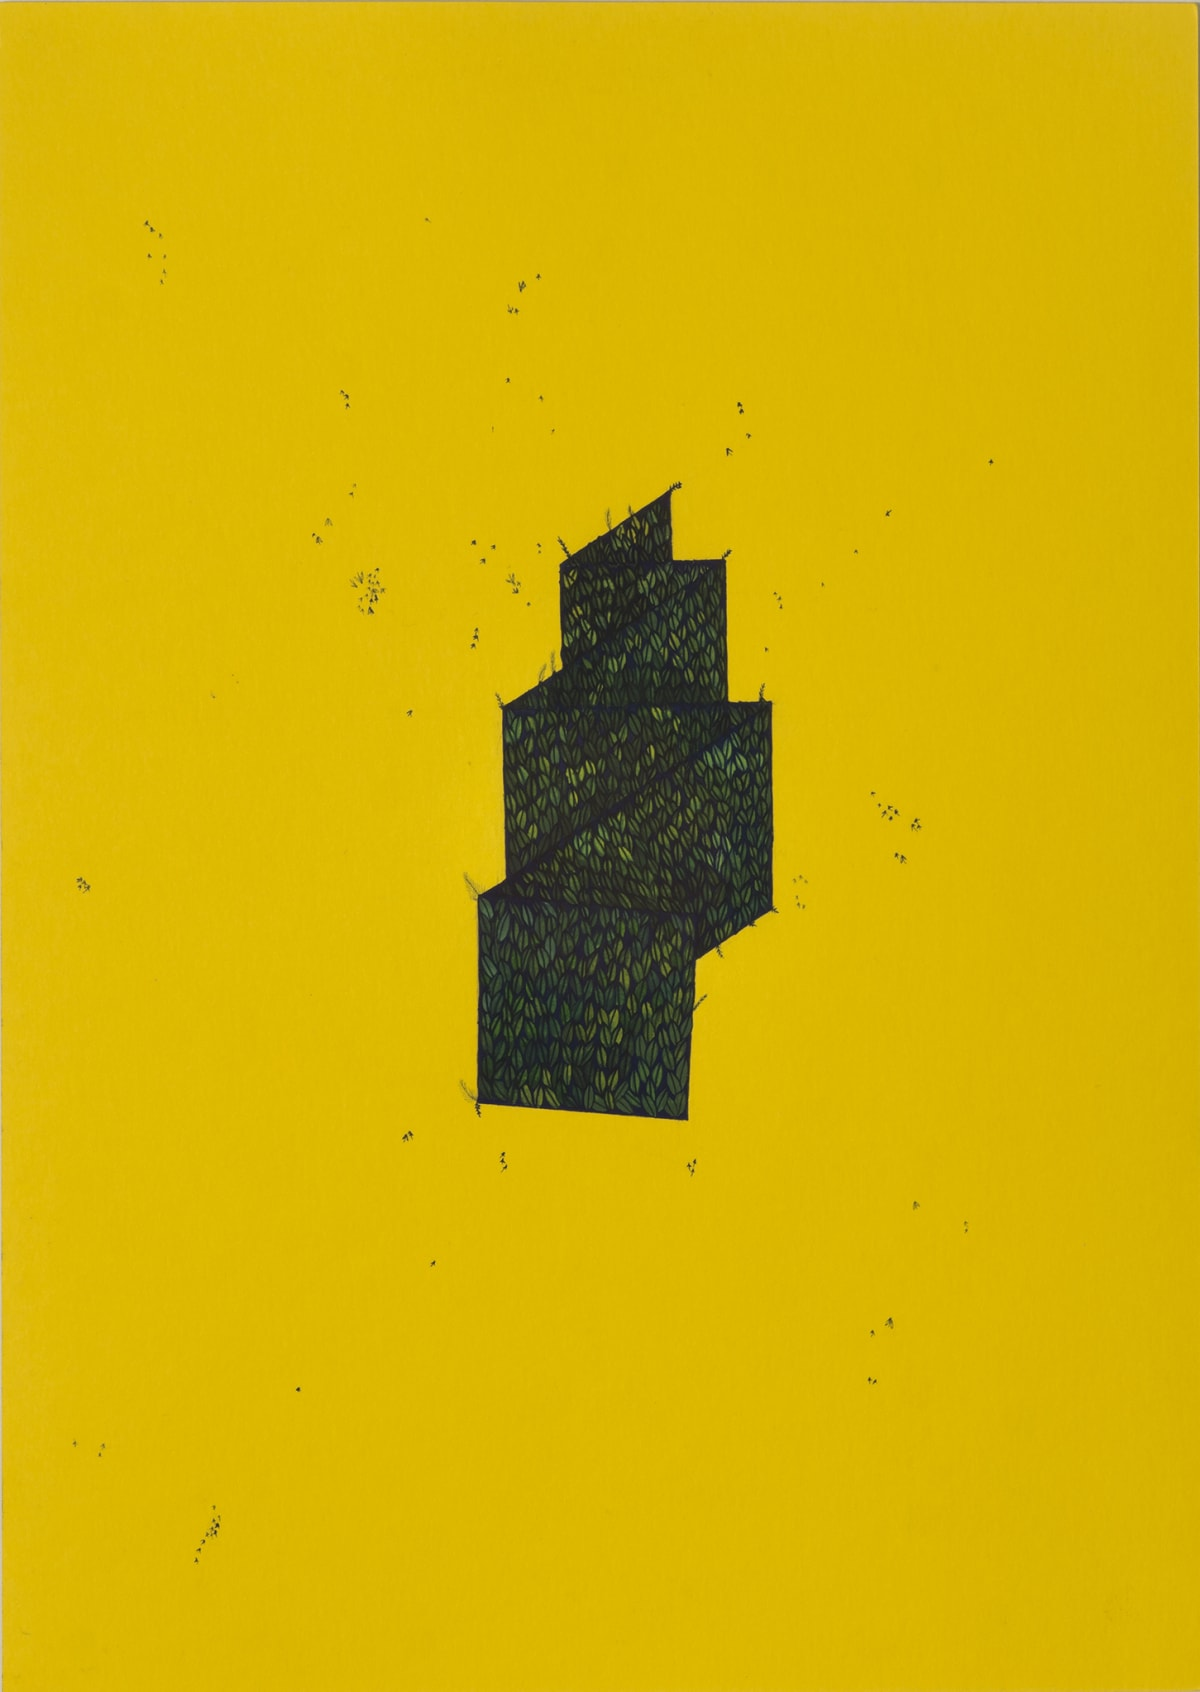 Wardha Shabbir An Object in Space, 2019 Gouache on paper 29 x 25.6 cm 11 3/8 x 10 1/8 in